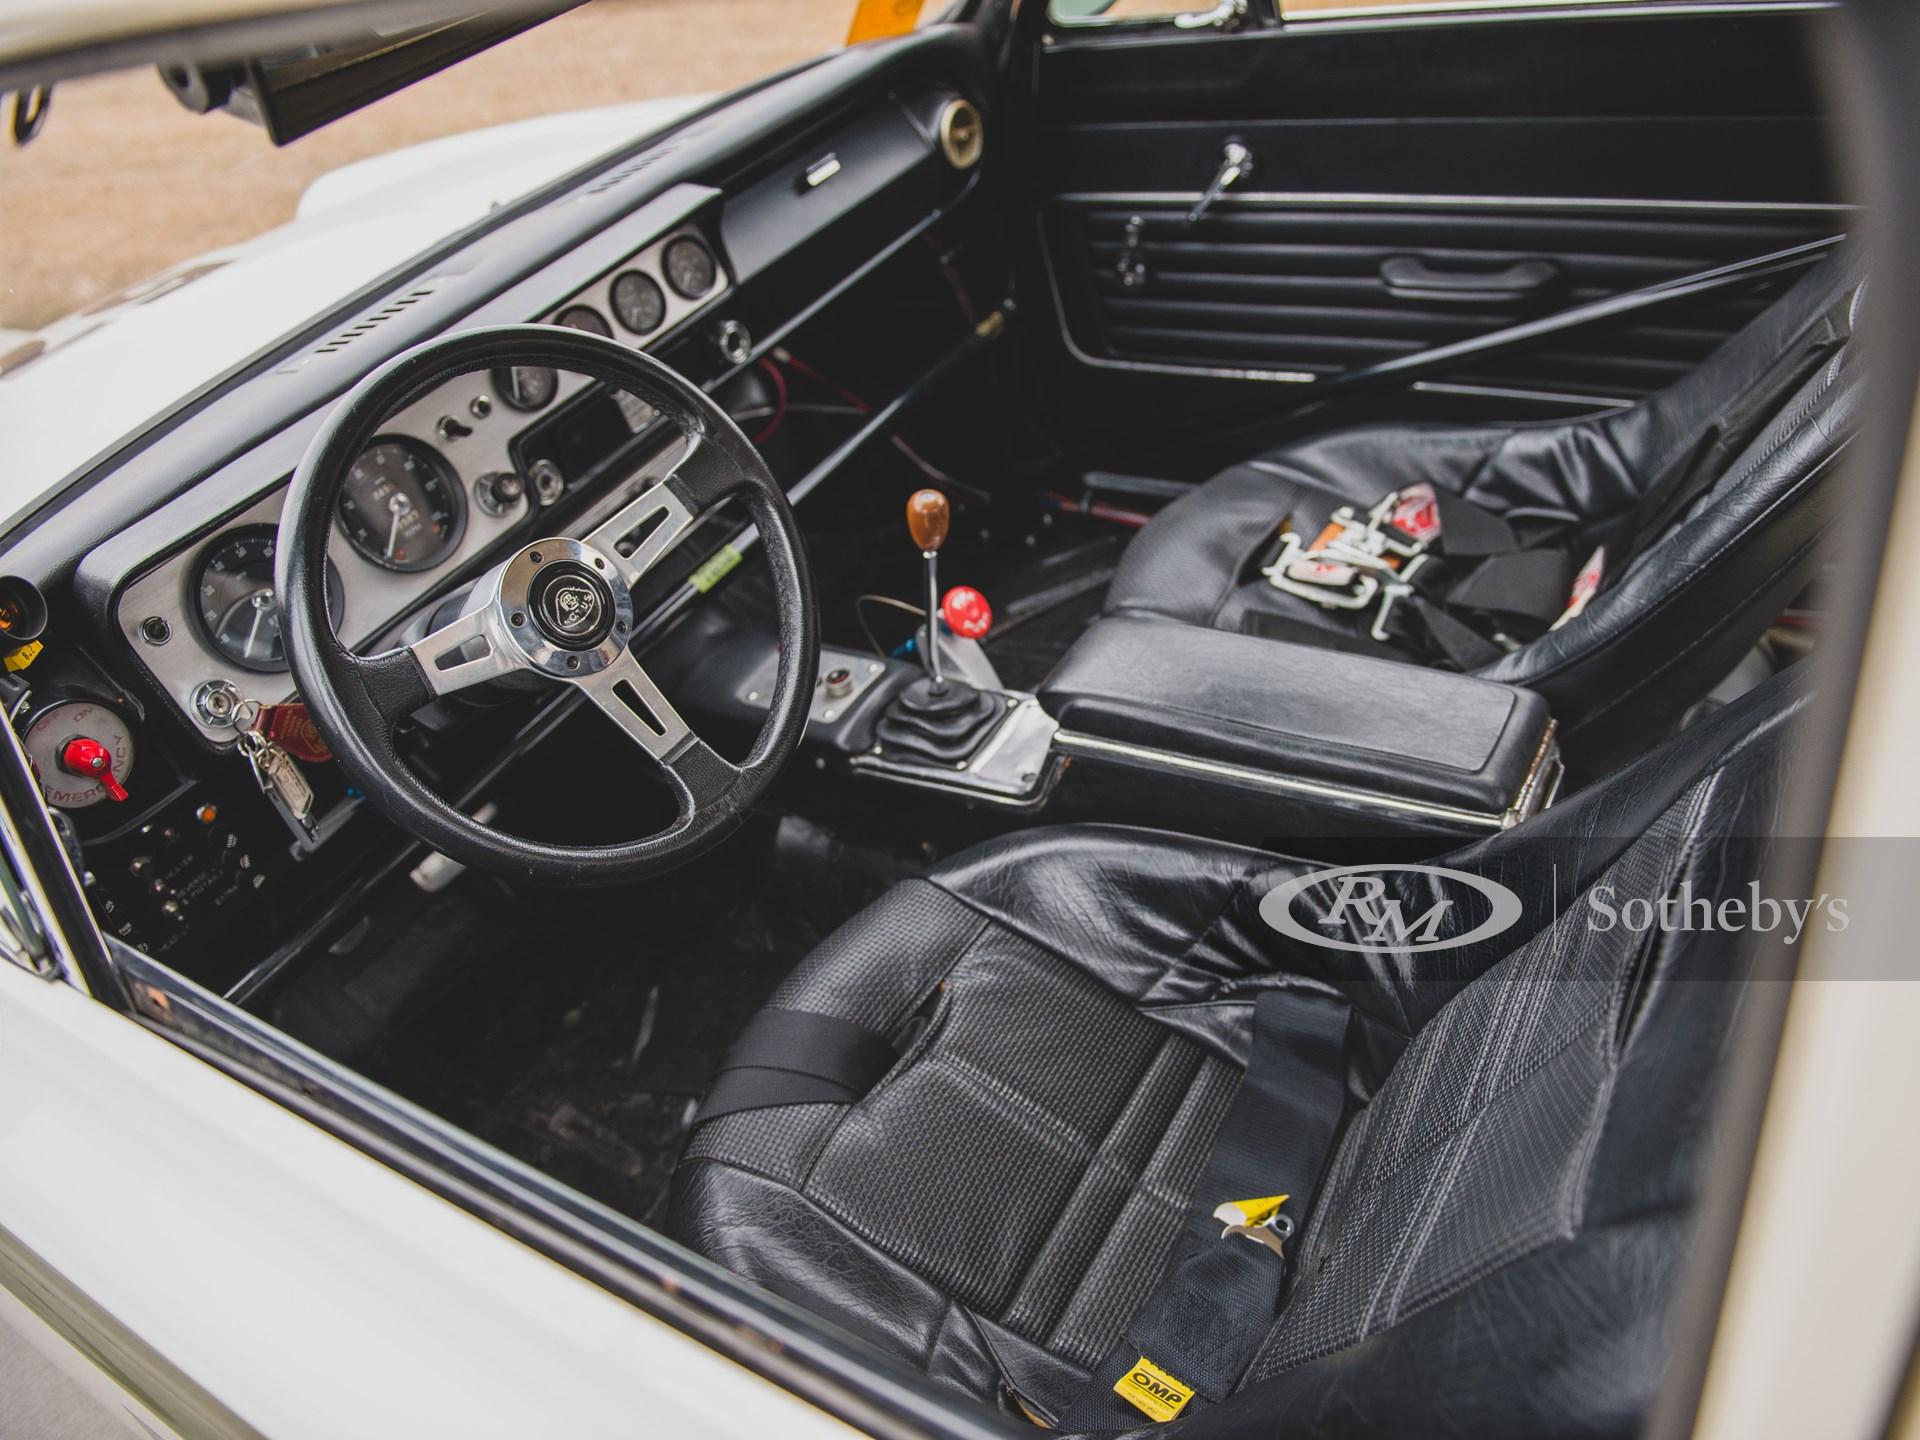 1966 Ford Cortina Lotus Mk 1 Race Car  -